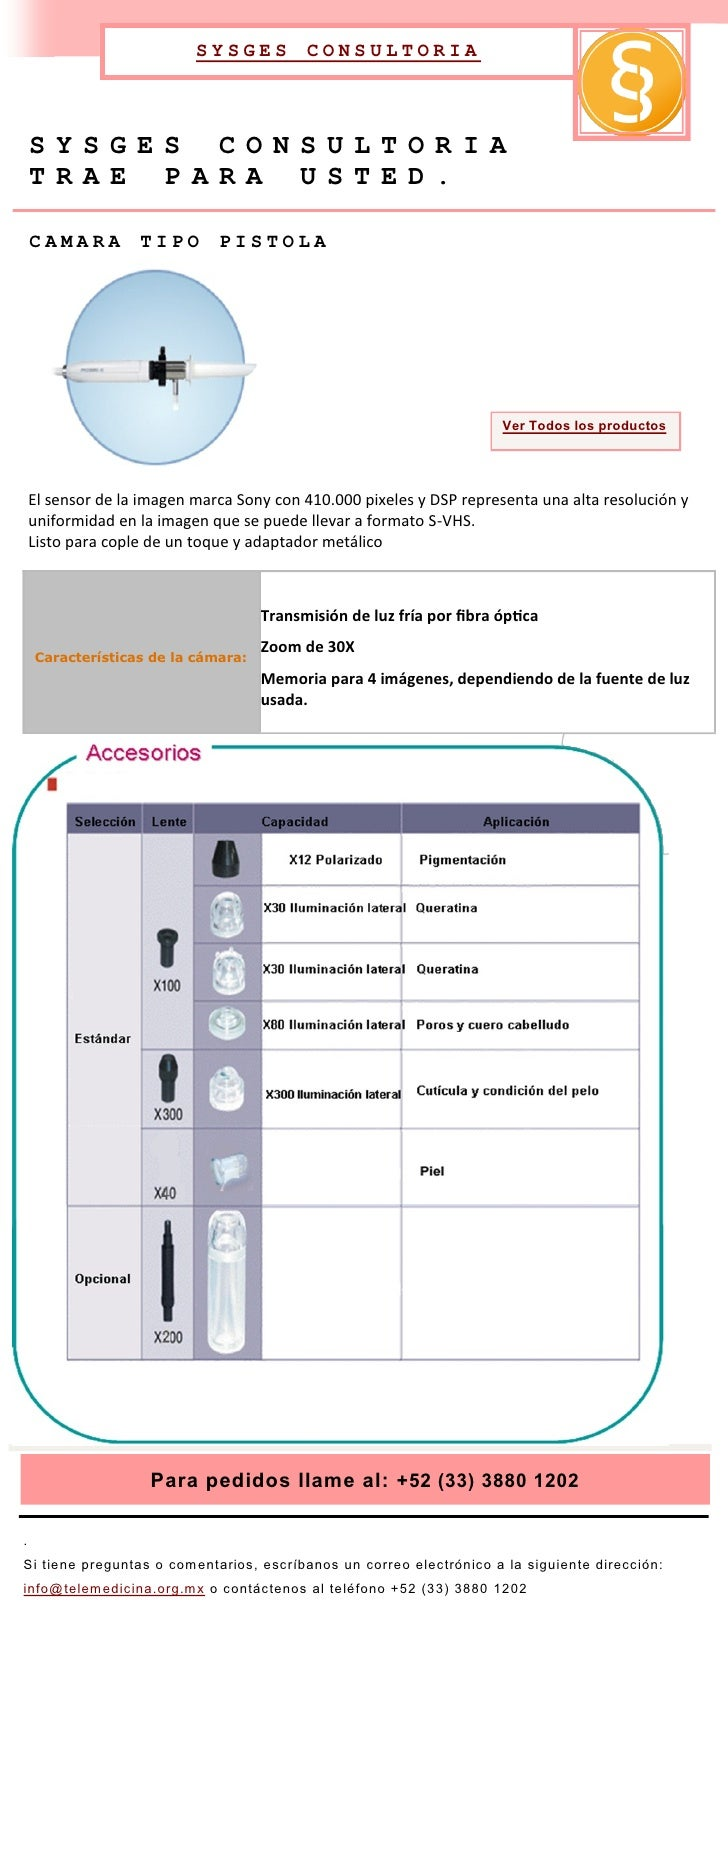 SYSGES         CONSULTORIA         SYSGES CONSULTORIA     TRAE PARA USTED.      CAMARA         TIPO       PISTOLA         ...